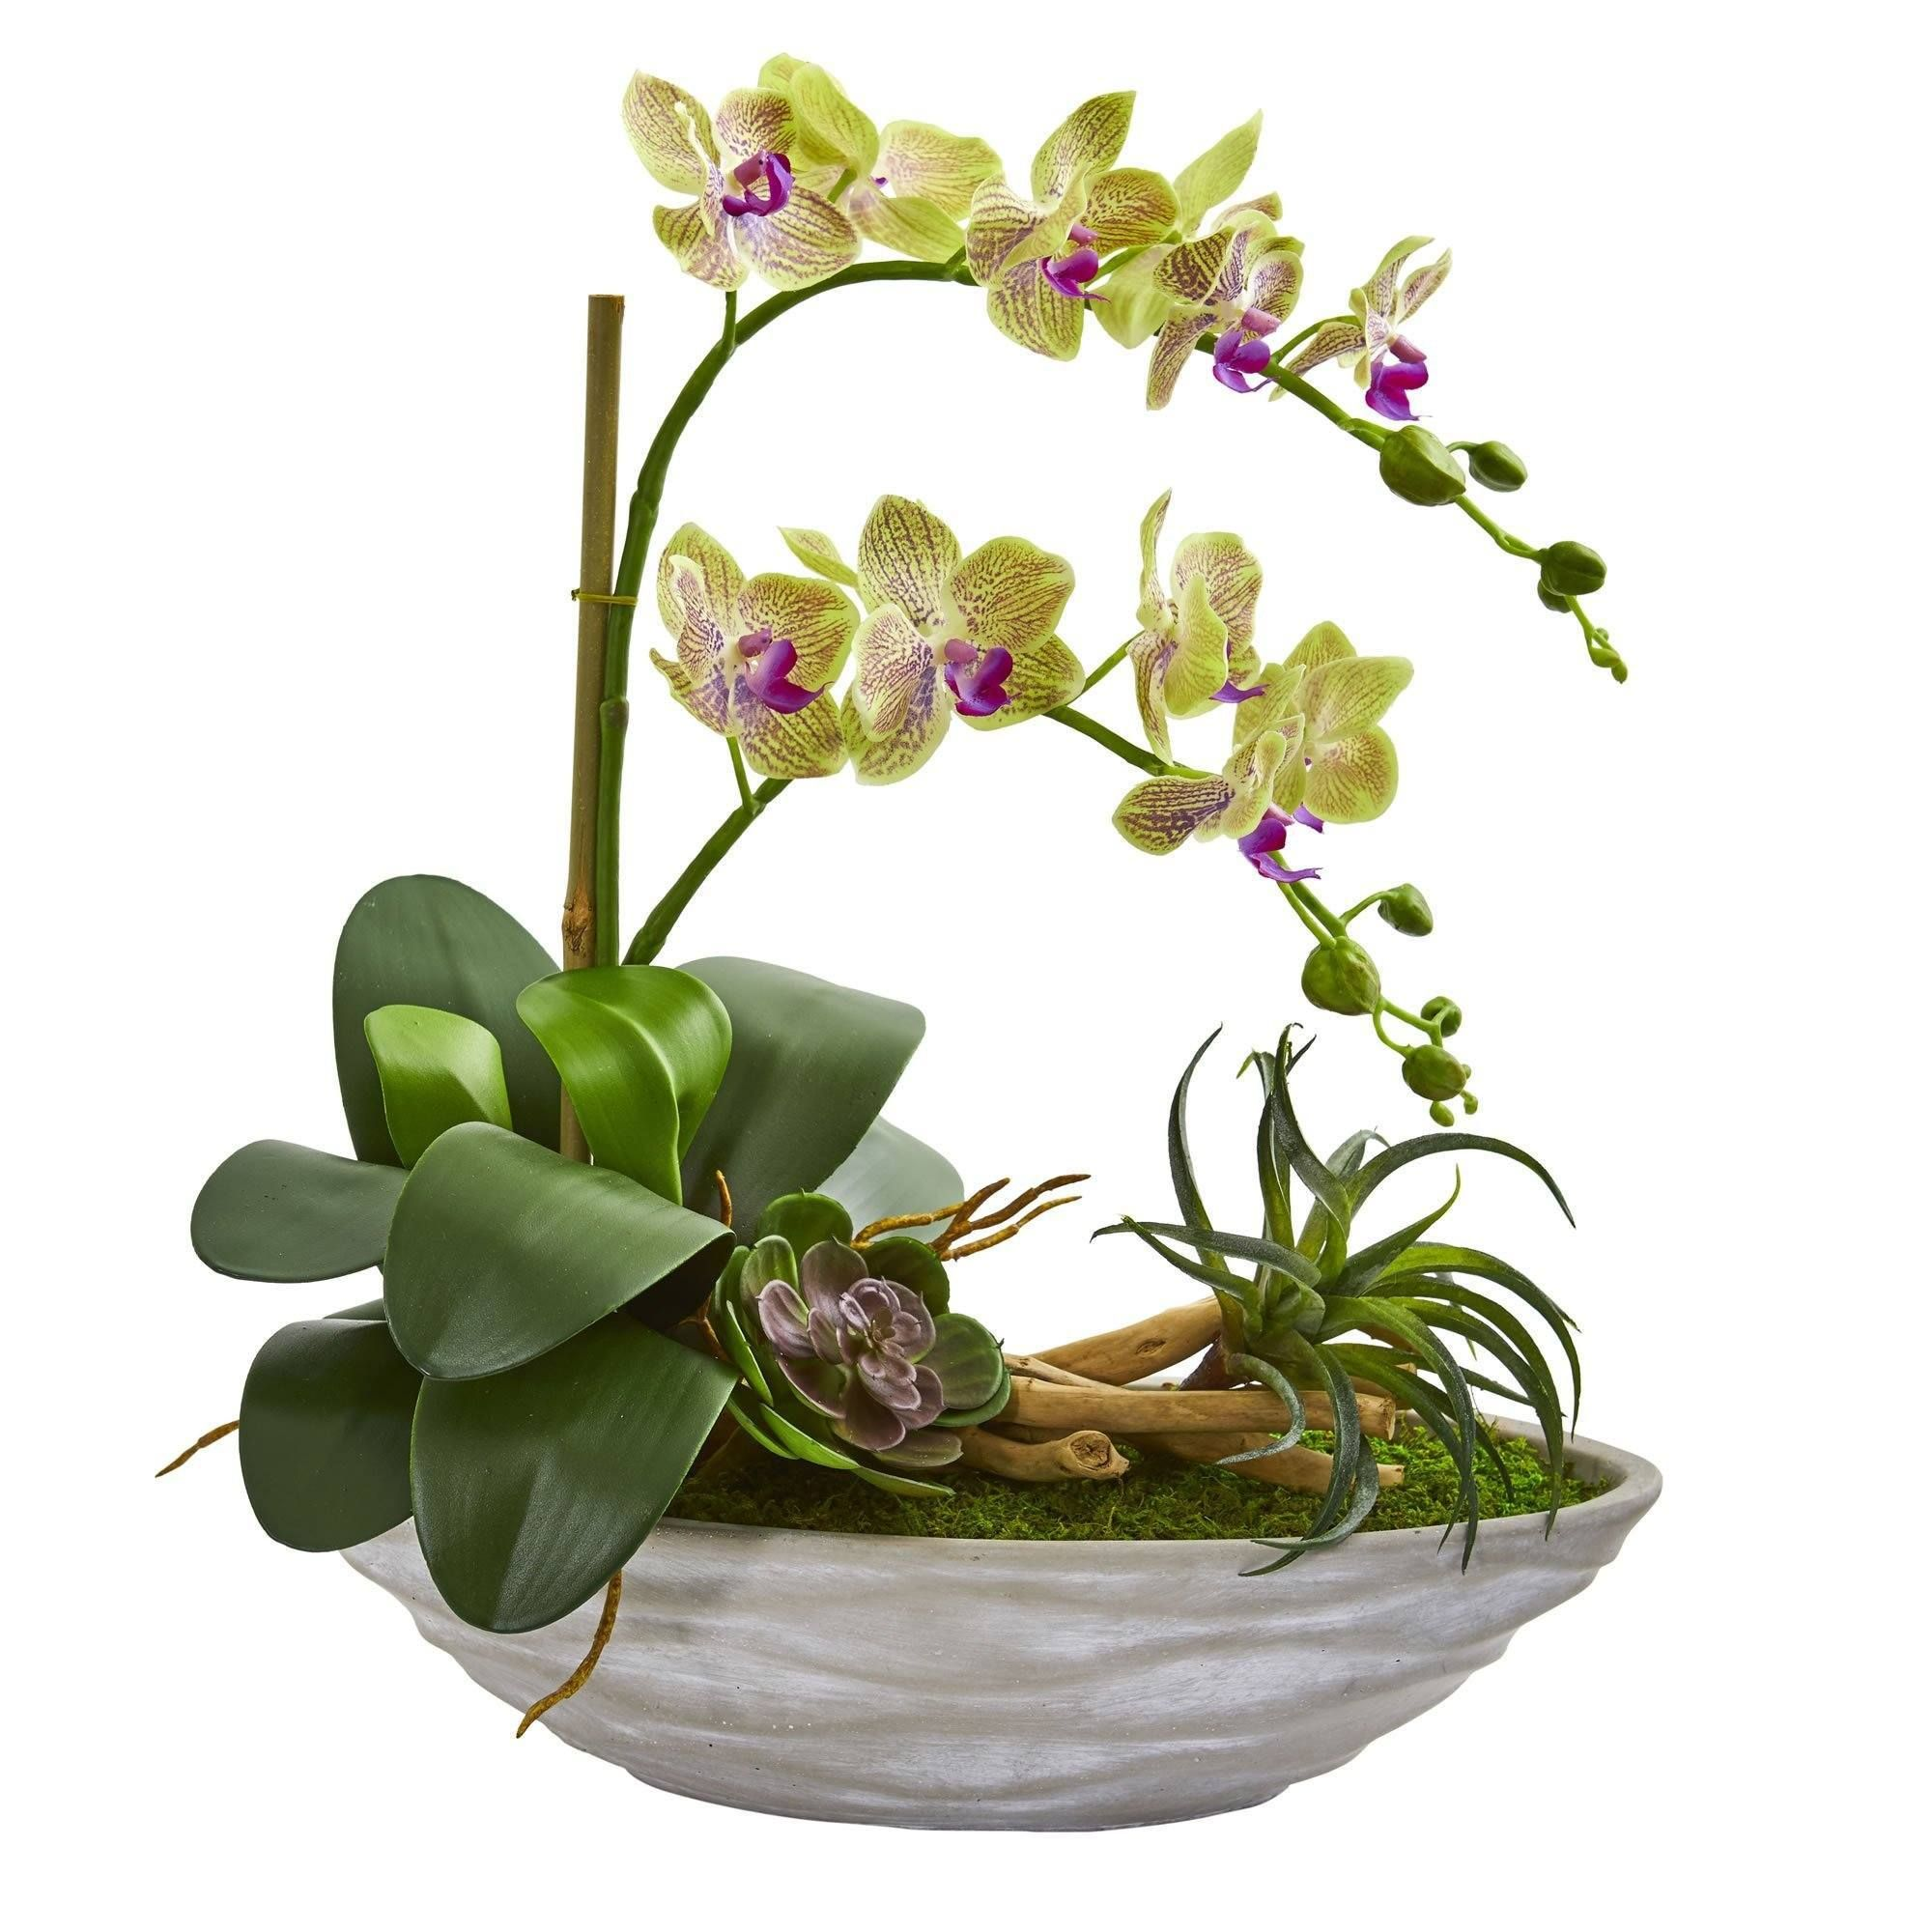 Phalaenopsis Orchid And Succulent Artificial Arrangement In White Vase In 2021 Succulent Landscape Design Succulent Arrangements Orchids